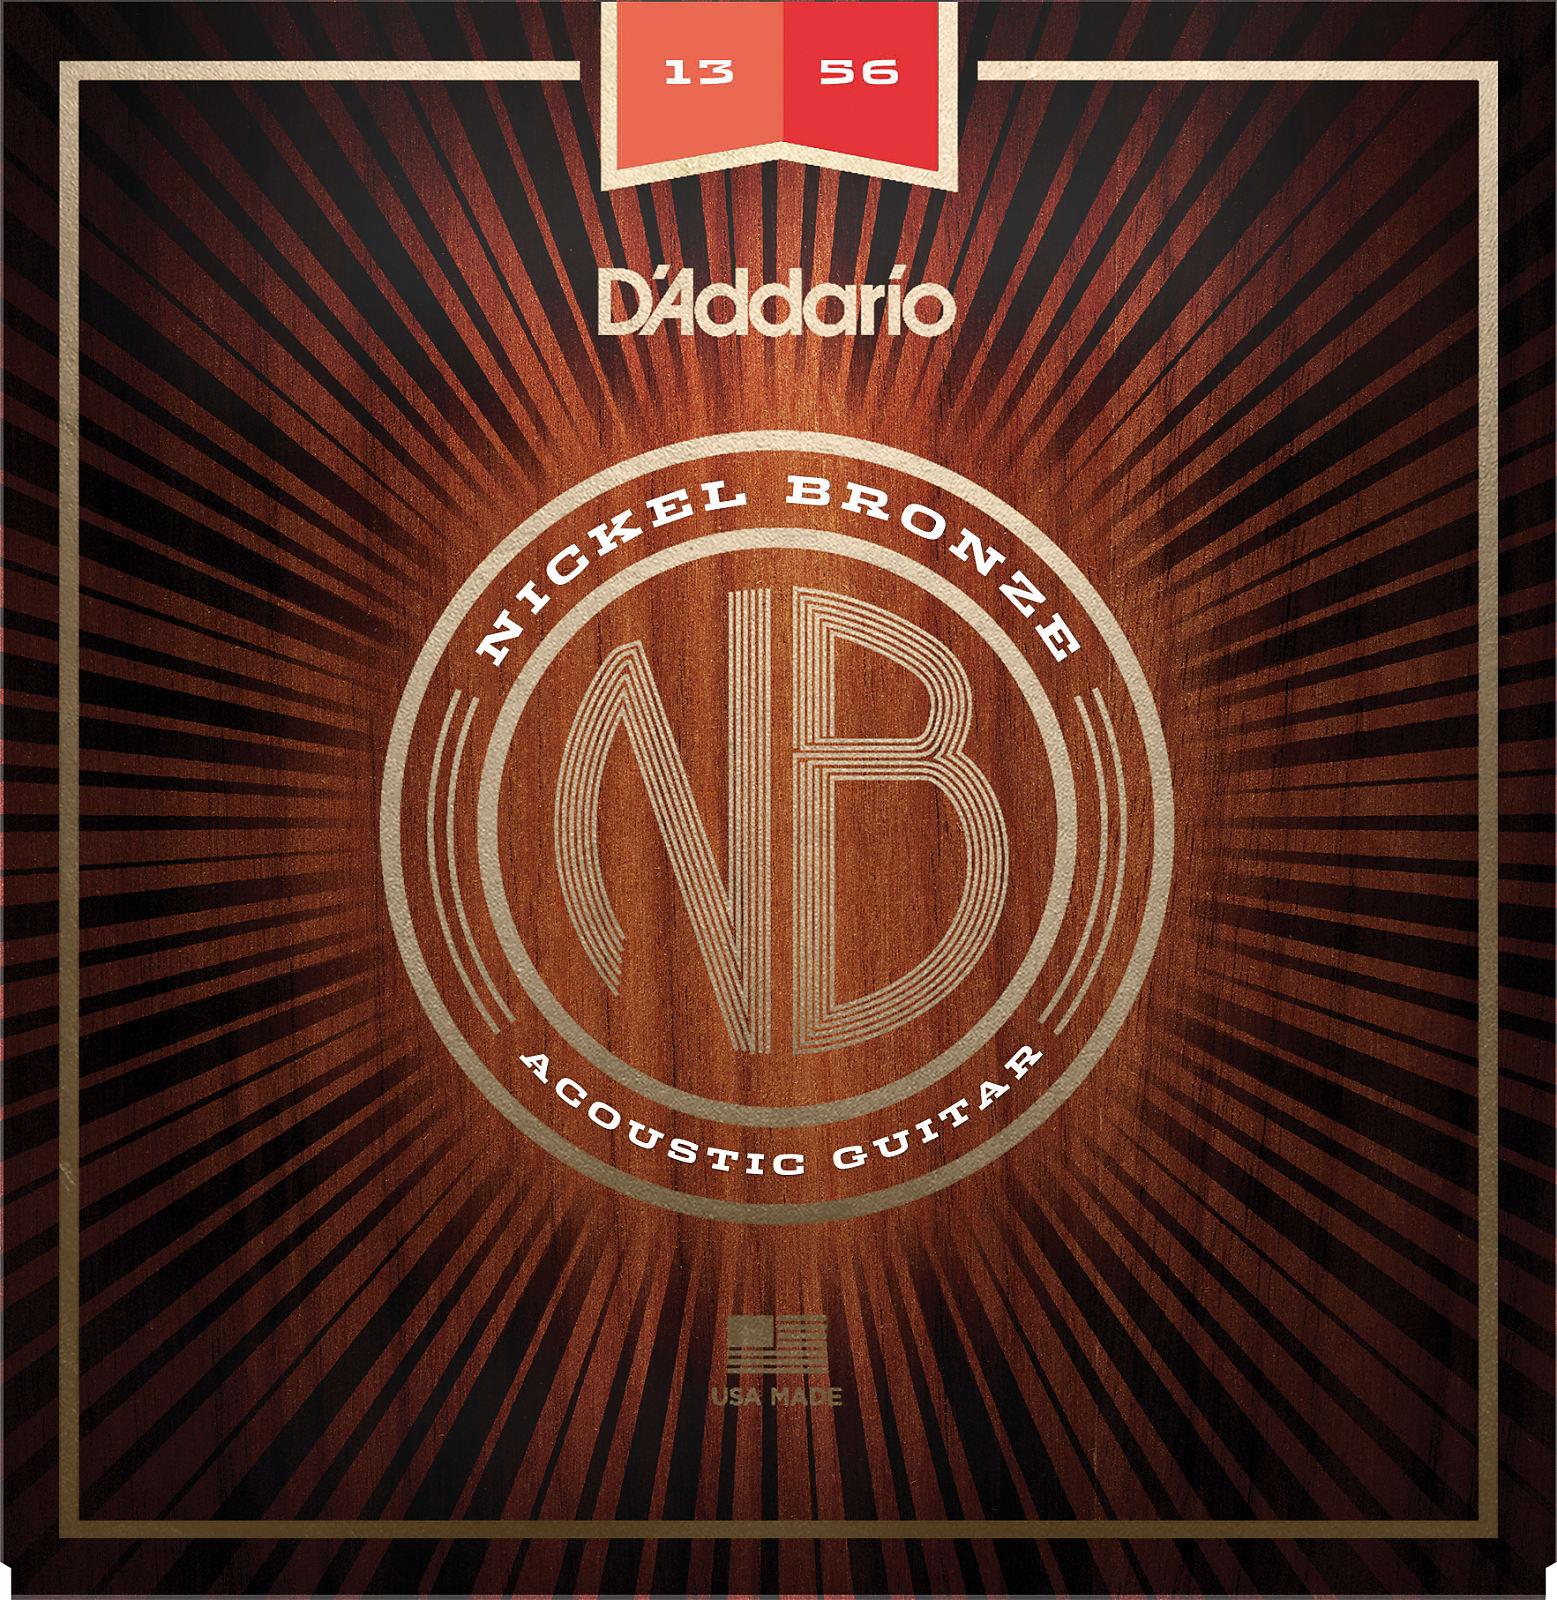 D'Addario NB1356 Nickel Bronze Acoustic Guitar Strings, Medium, 13-56